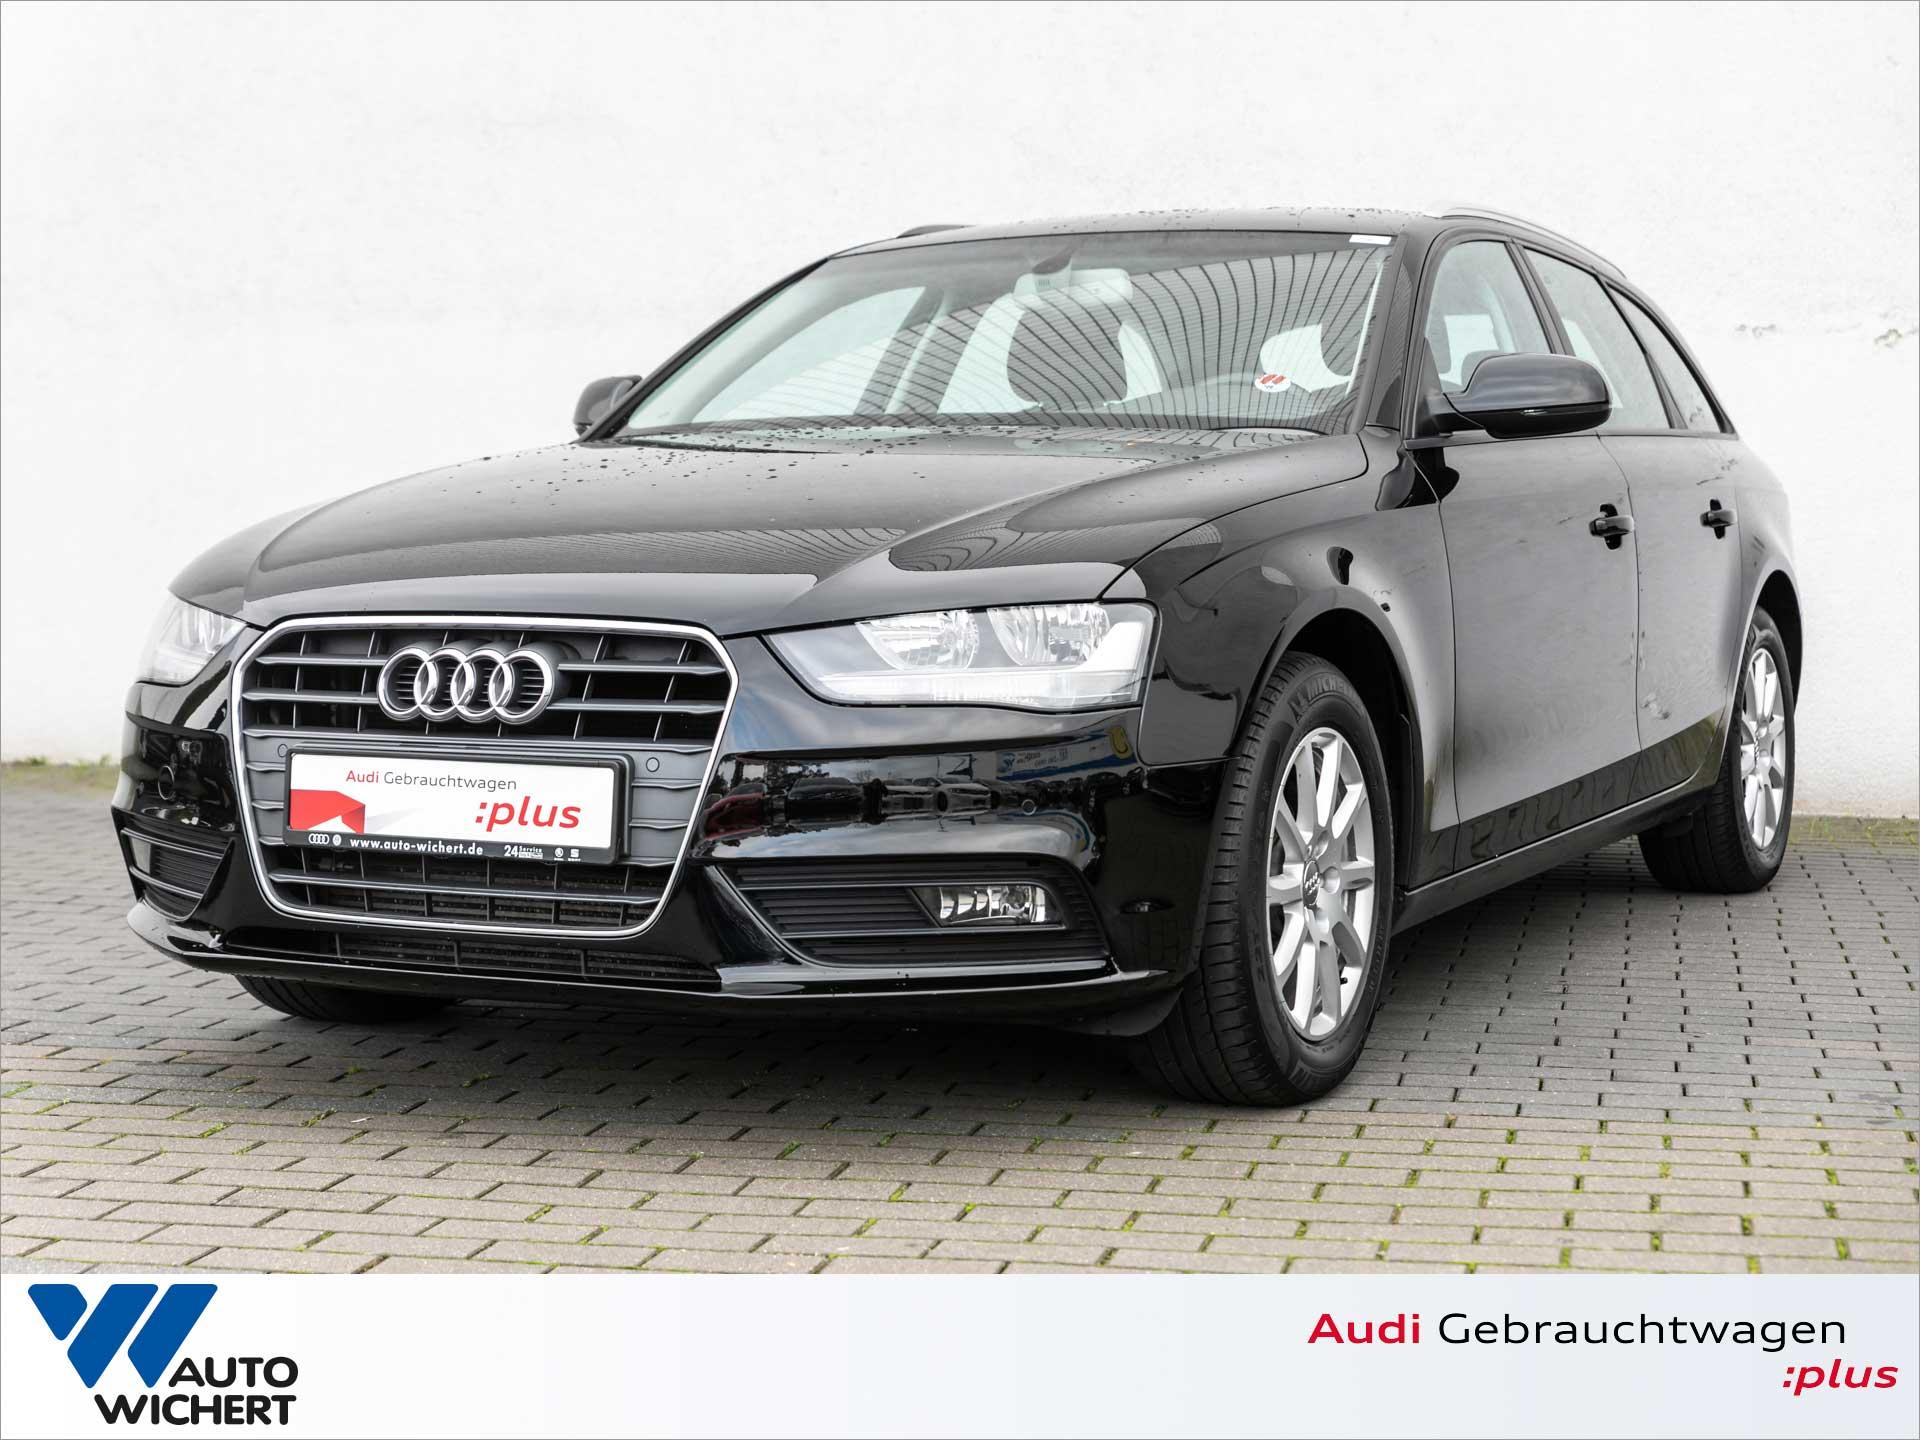 Audi A4 Avant 2.0 TDI 6-Gang NAVI/ AHK/ EINPARKHILFE, Jahr 2014, diesel